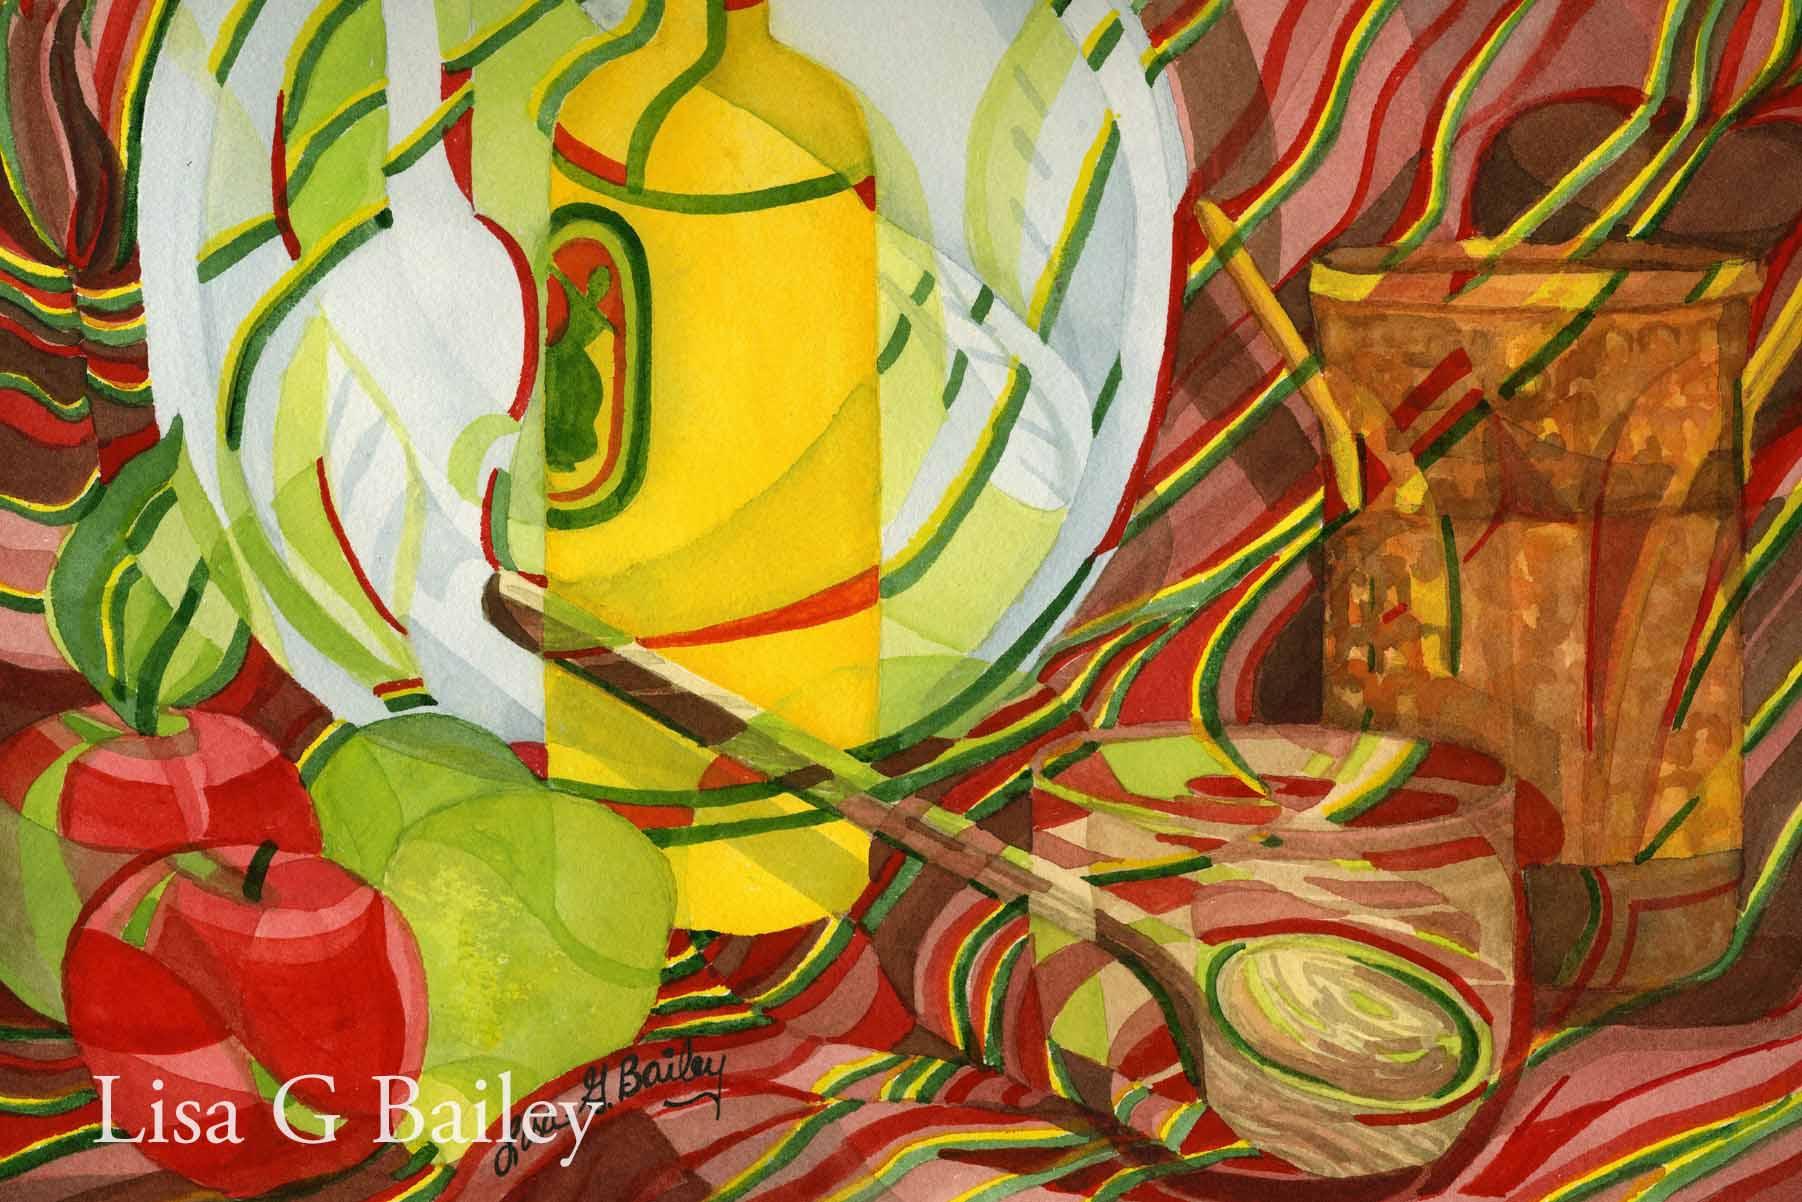 Lisa G Bailey. Preparation. colorweave watercolor